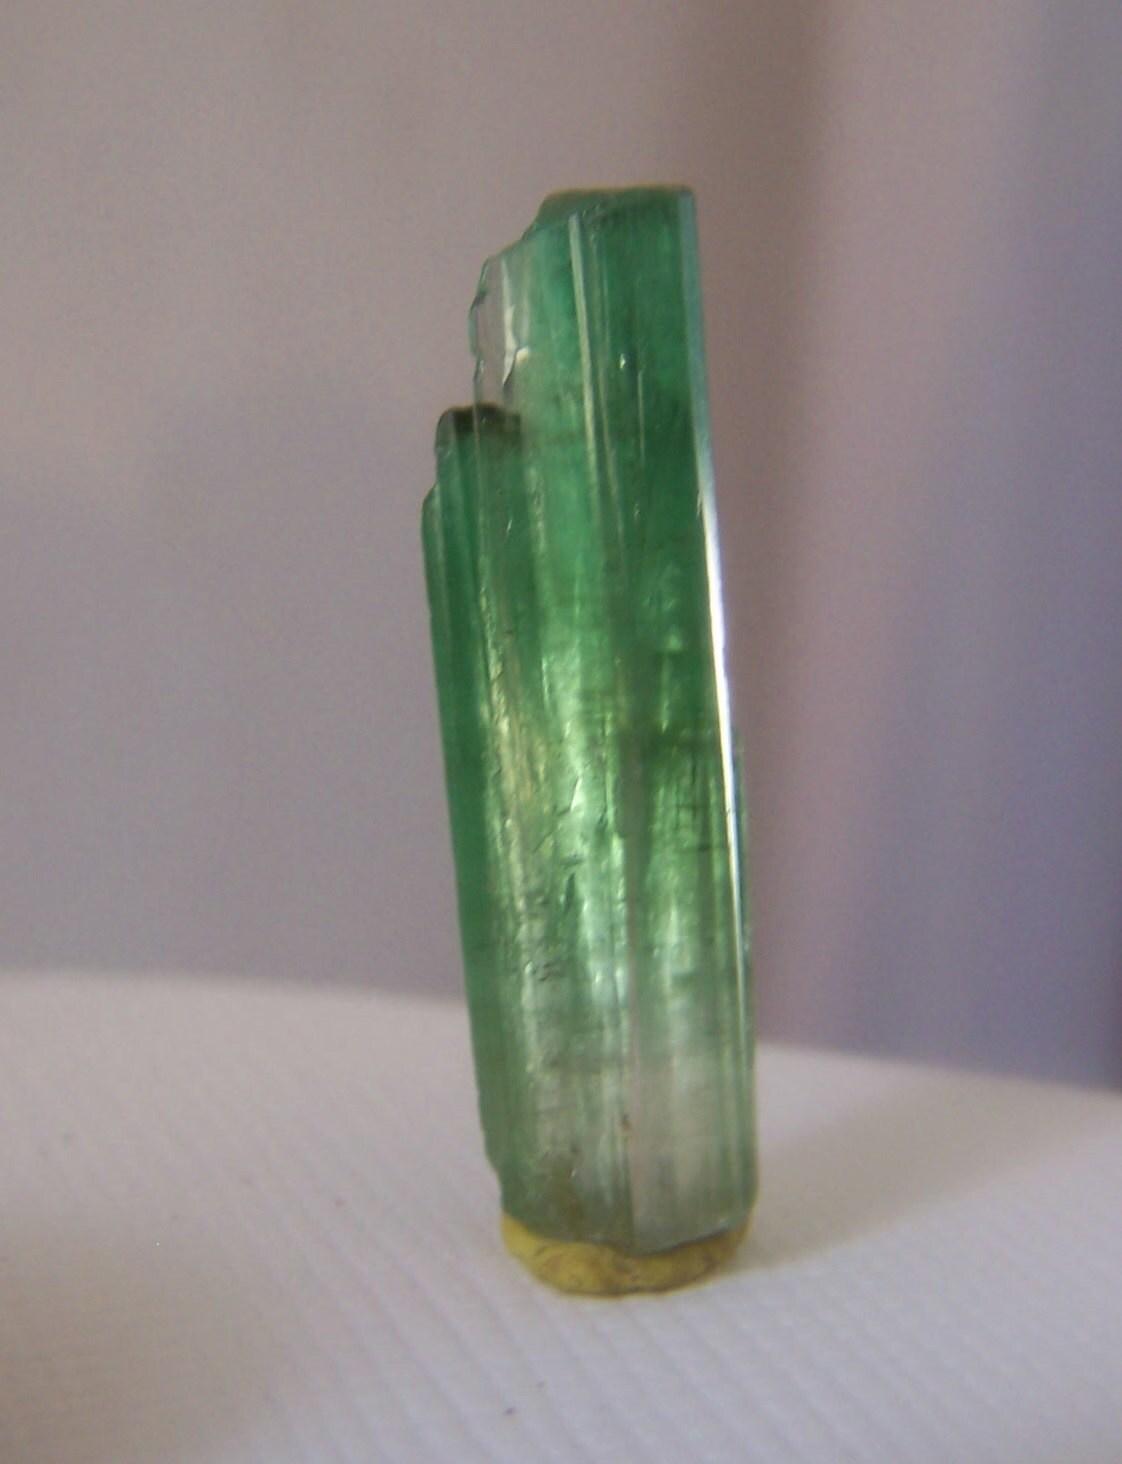 Bright Green Tourmaline Crystal Tourmaline Specimen